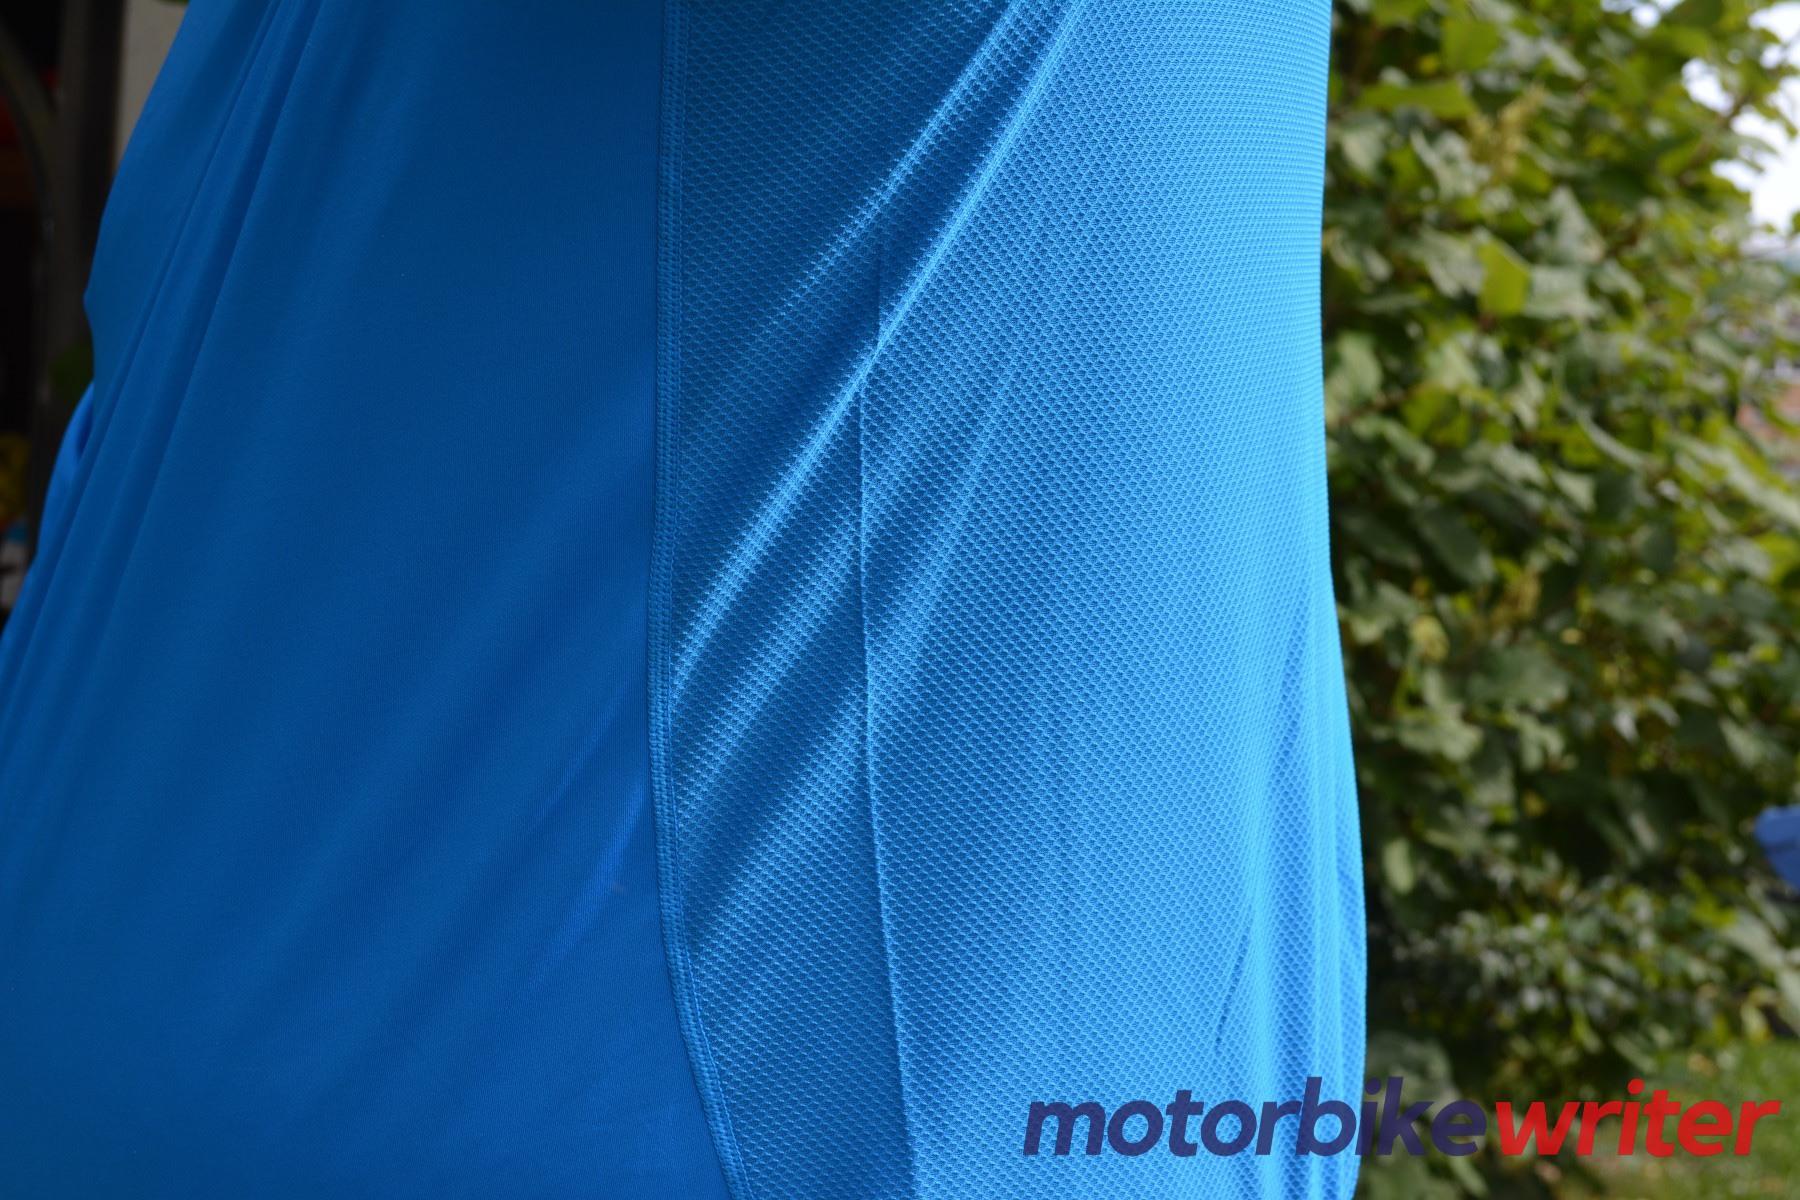 Close-up of side seam on blue Fieldsheer Long Sleeve shirt